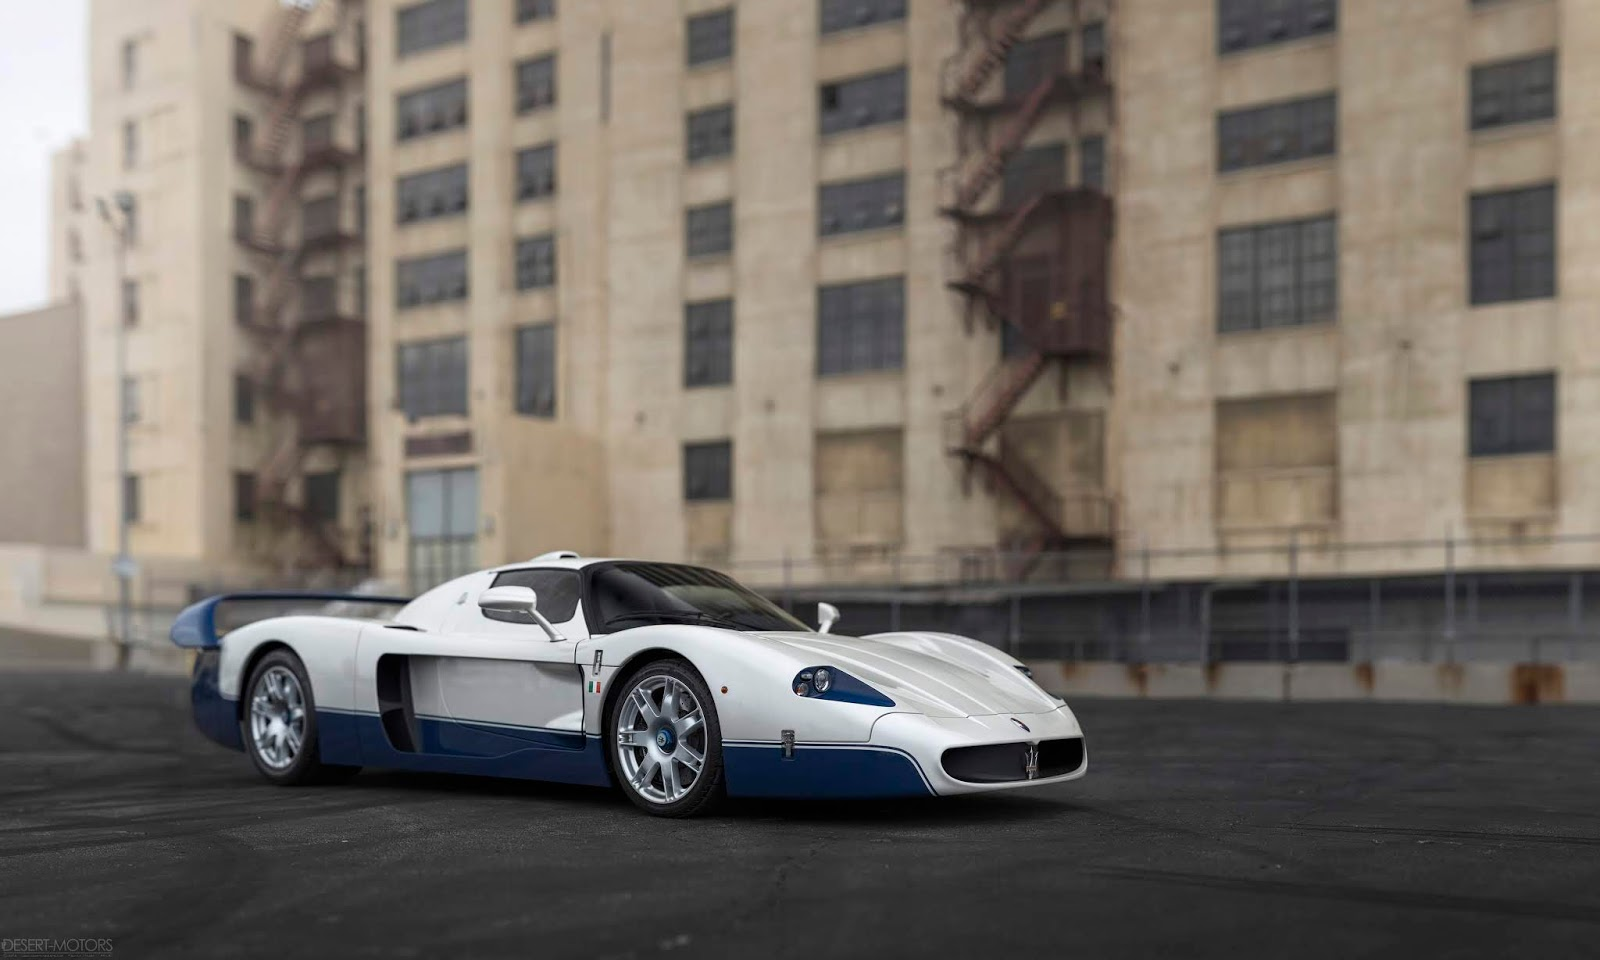 43506413335 177804e388 o Maserati MC12. Η Enzo Aperta. Maserati, Maserati MC12, MC12, retrocar, retrocar sunday, zblog